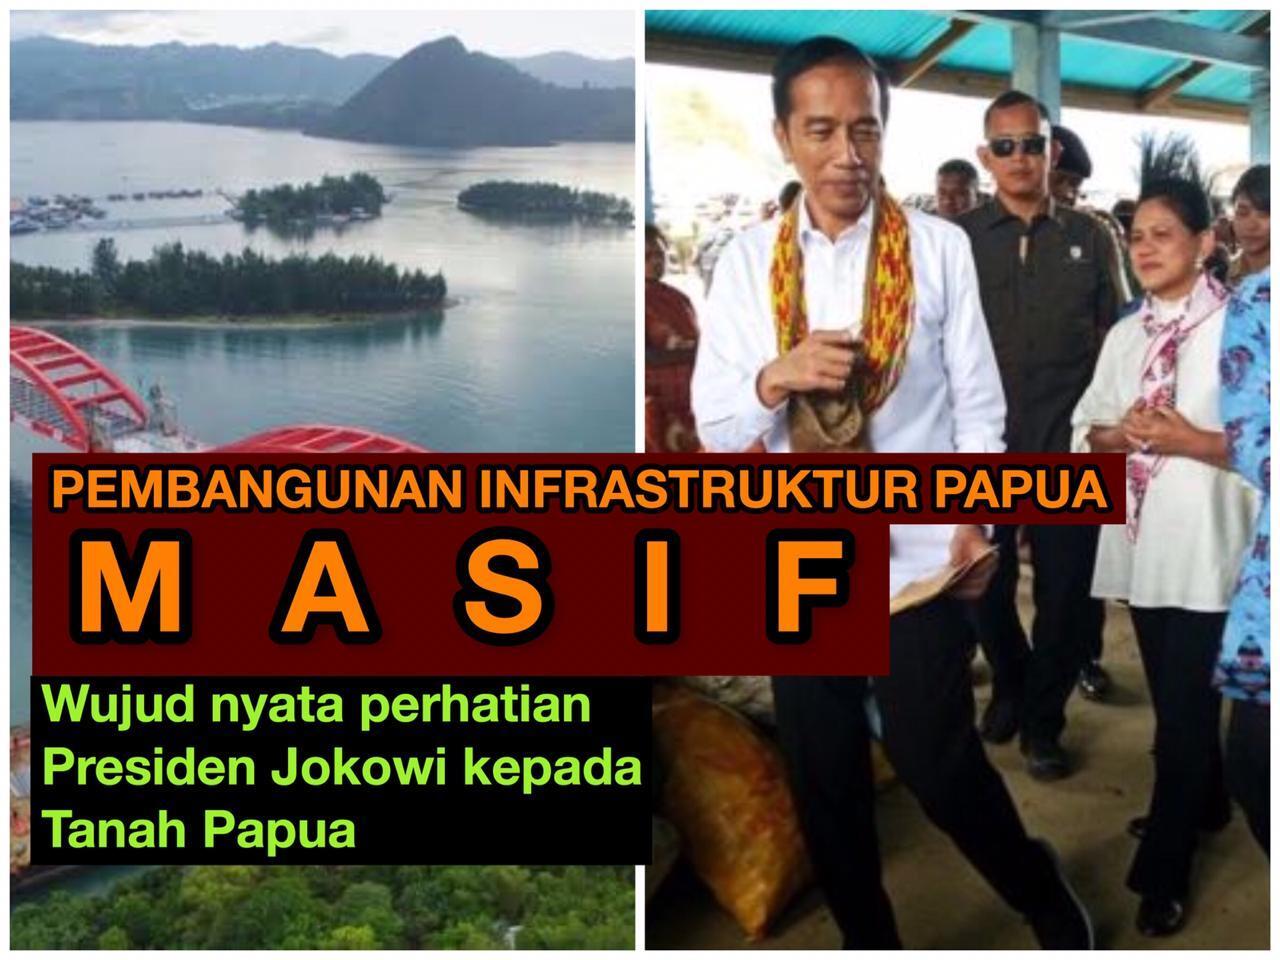 Presiden Jokowi Terus Membangun Papua, Inilah Realisasi dari Komitmen Memajukan Papua